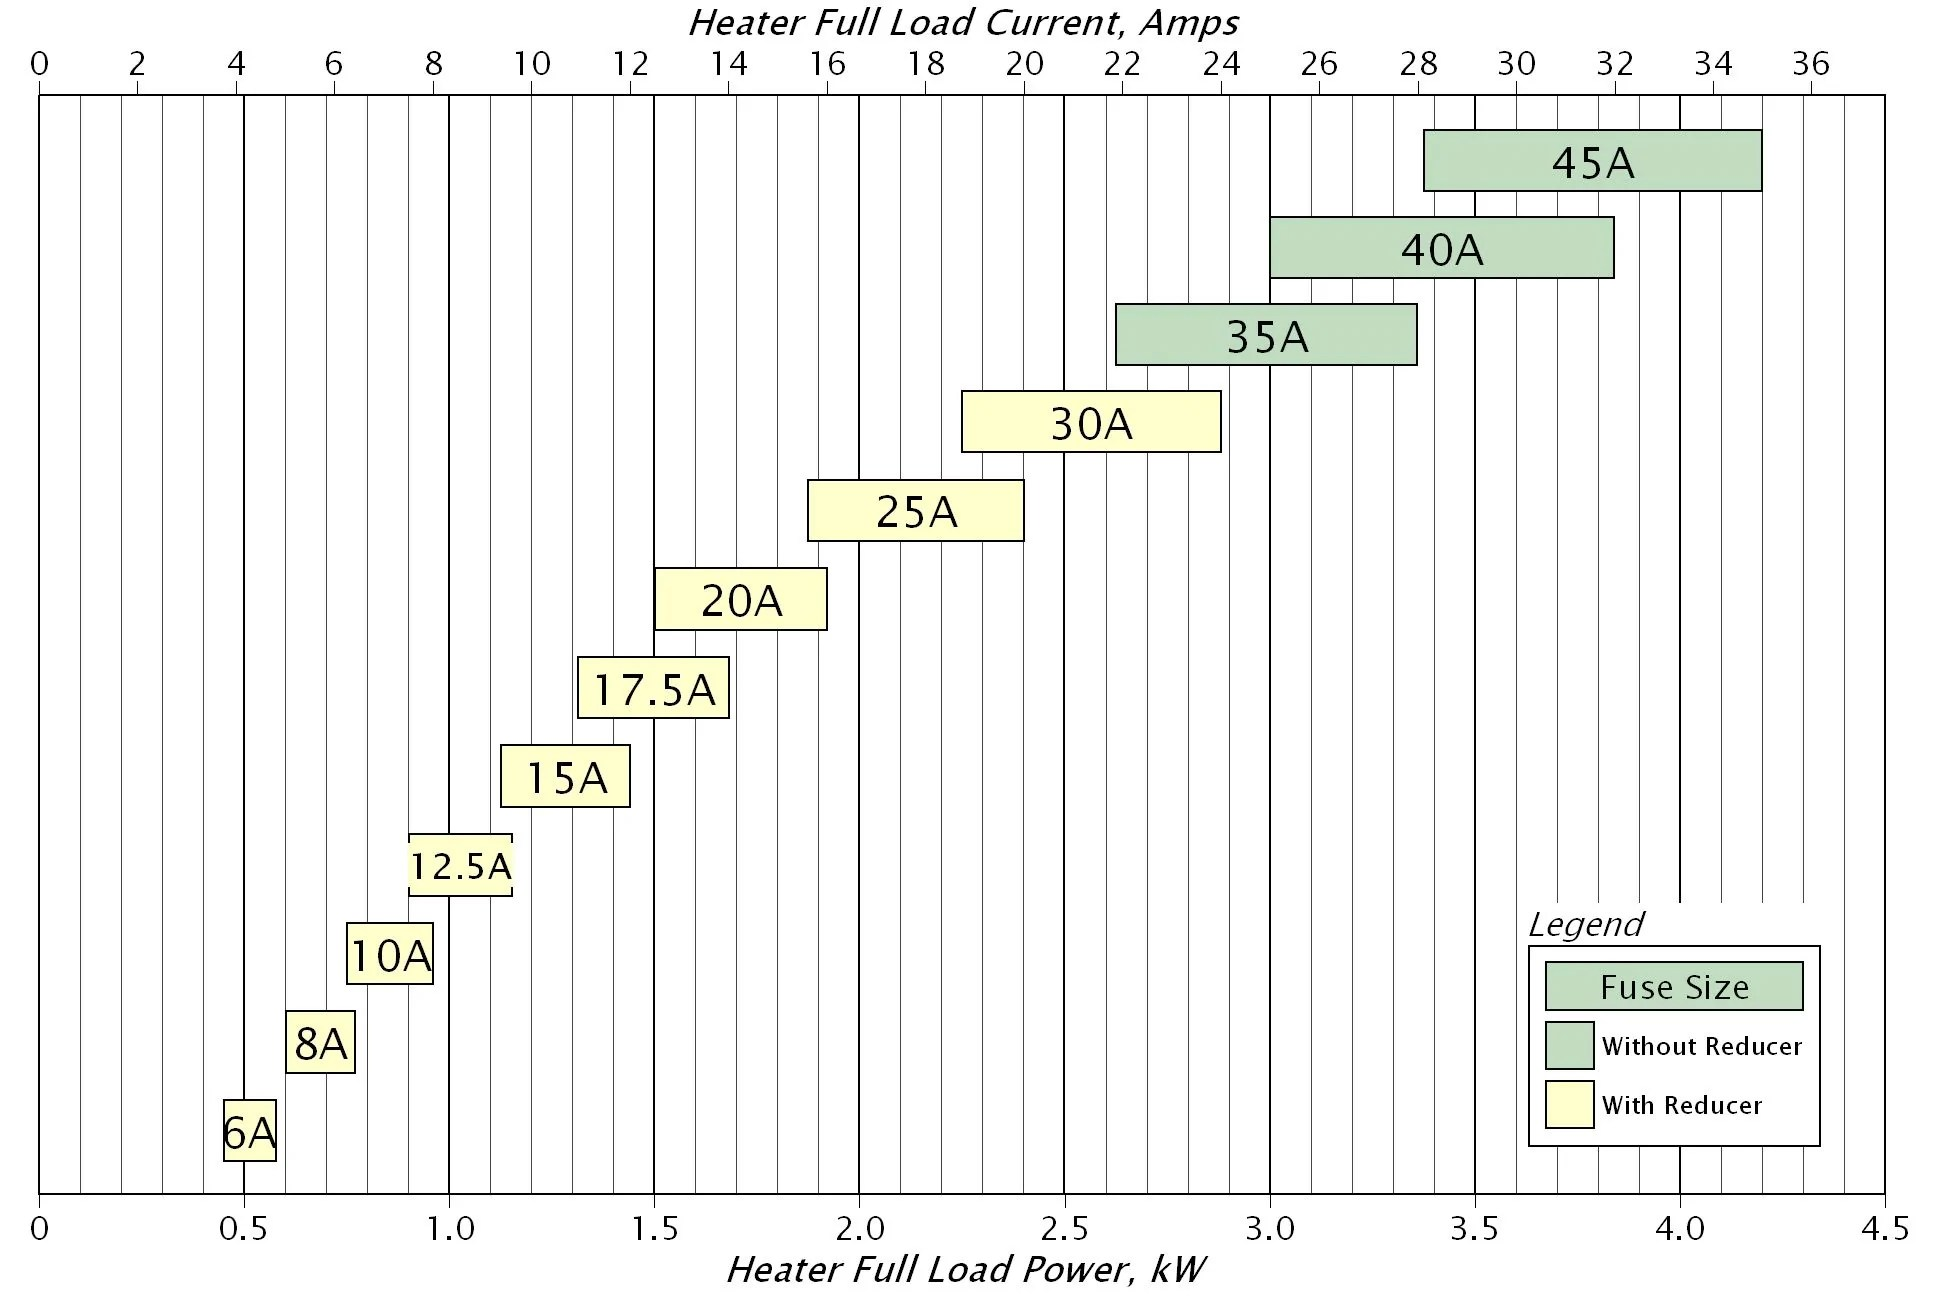 fuse sizing diagram ifpa 120 1p 35a  [ 1950 x 1313 Pixel ]